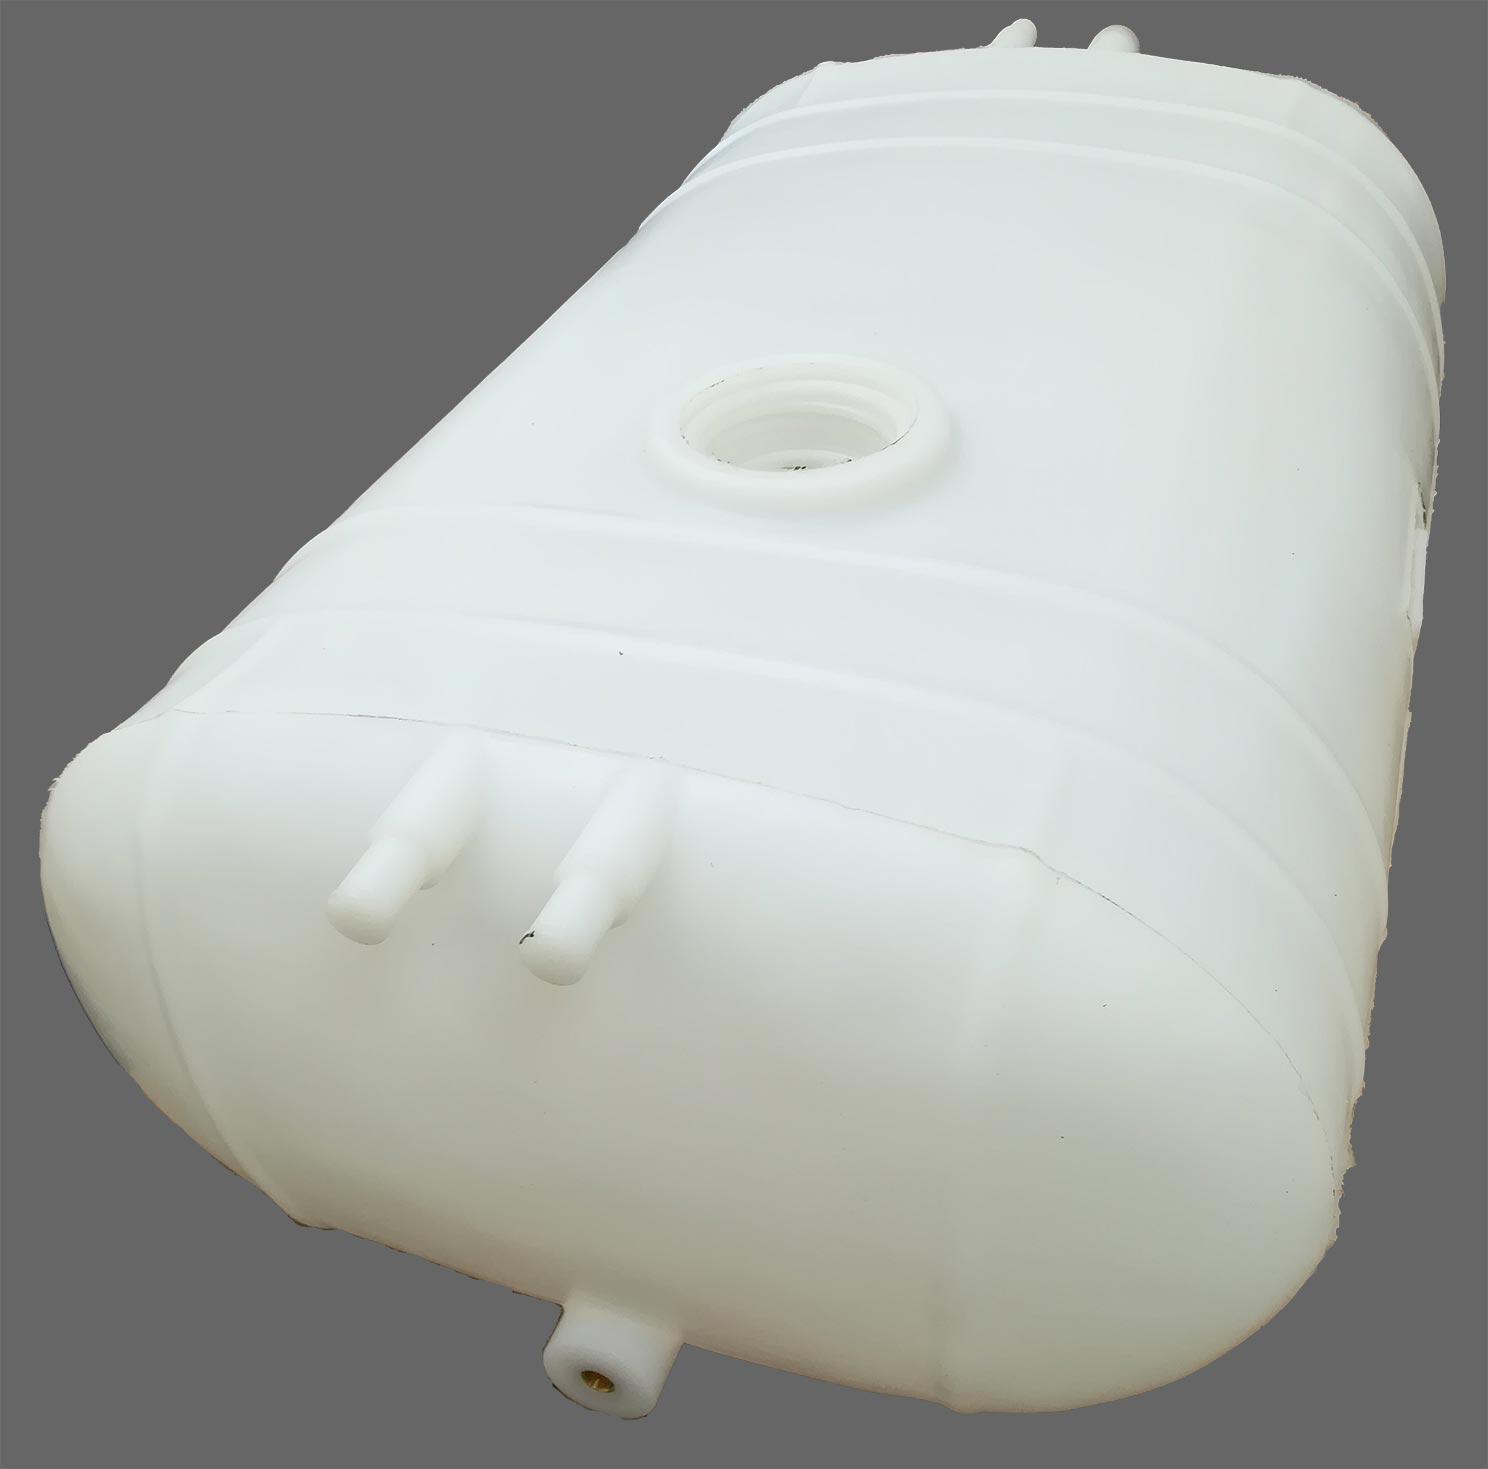 Rotationsstøbning - Plasttank